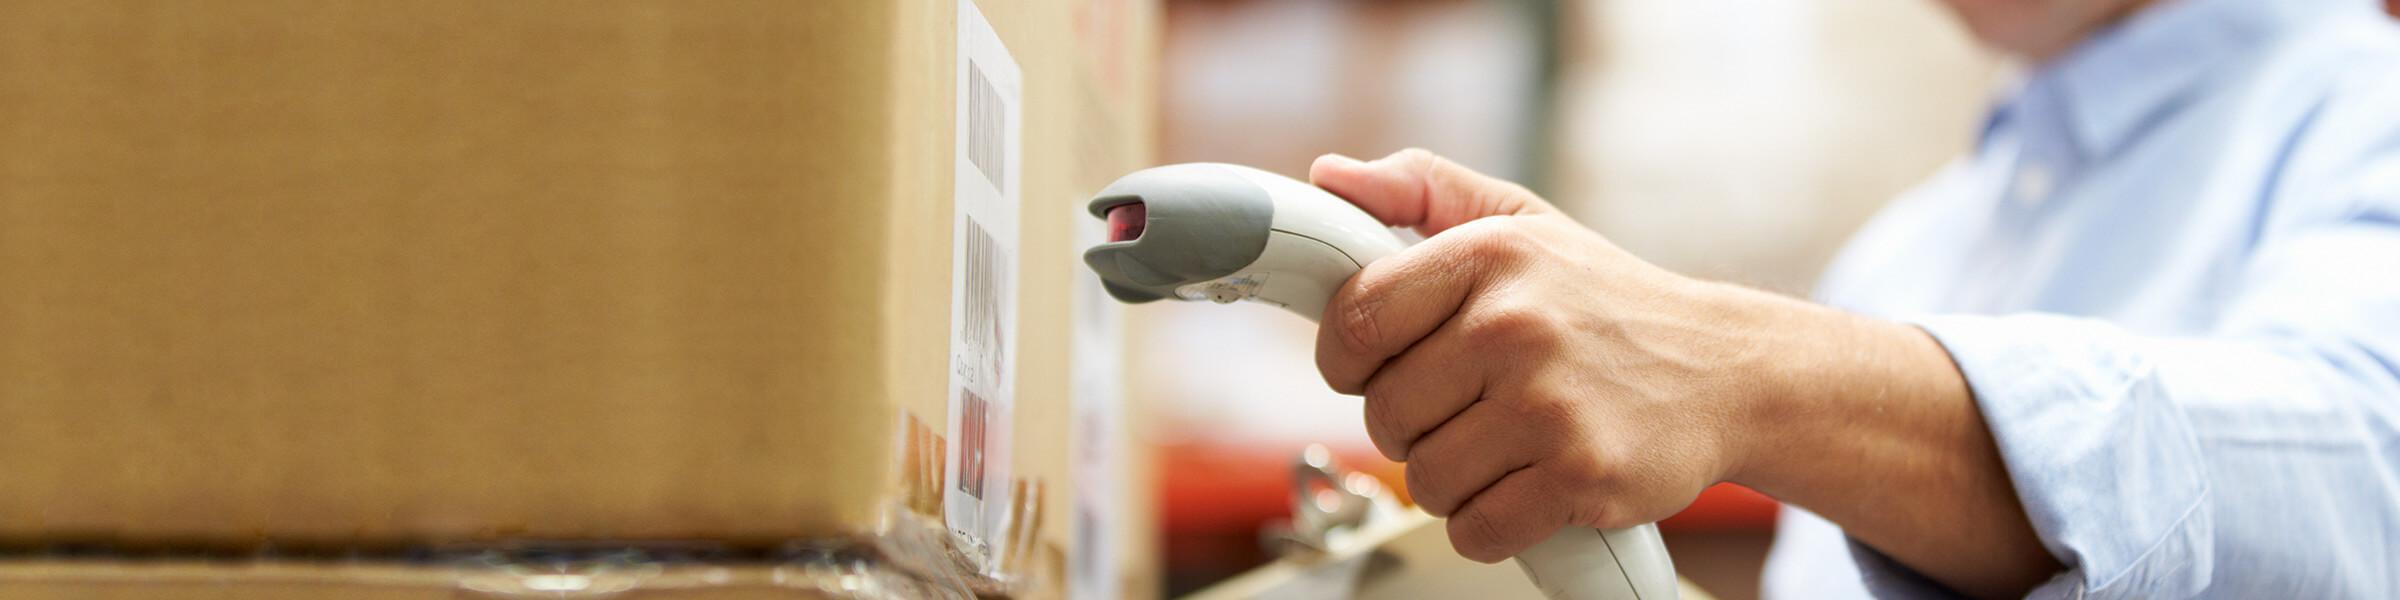 fulfillment barcode scan